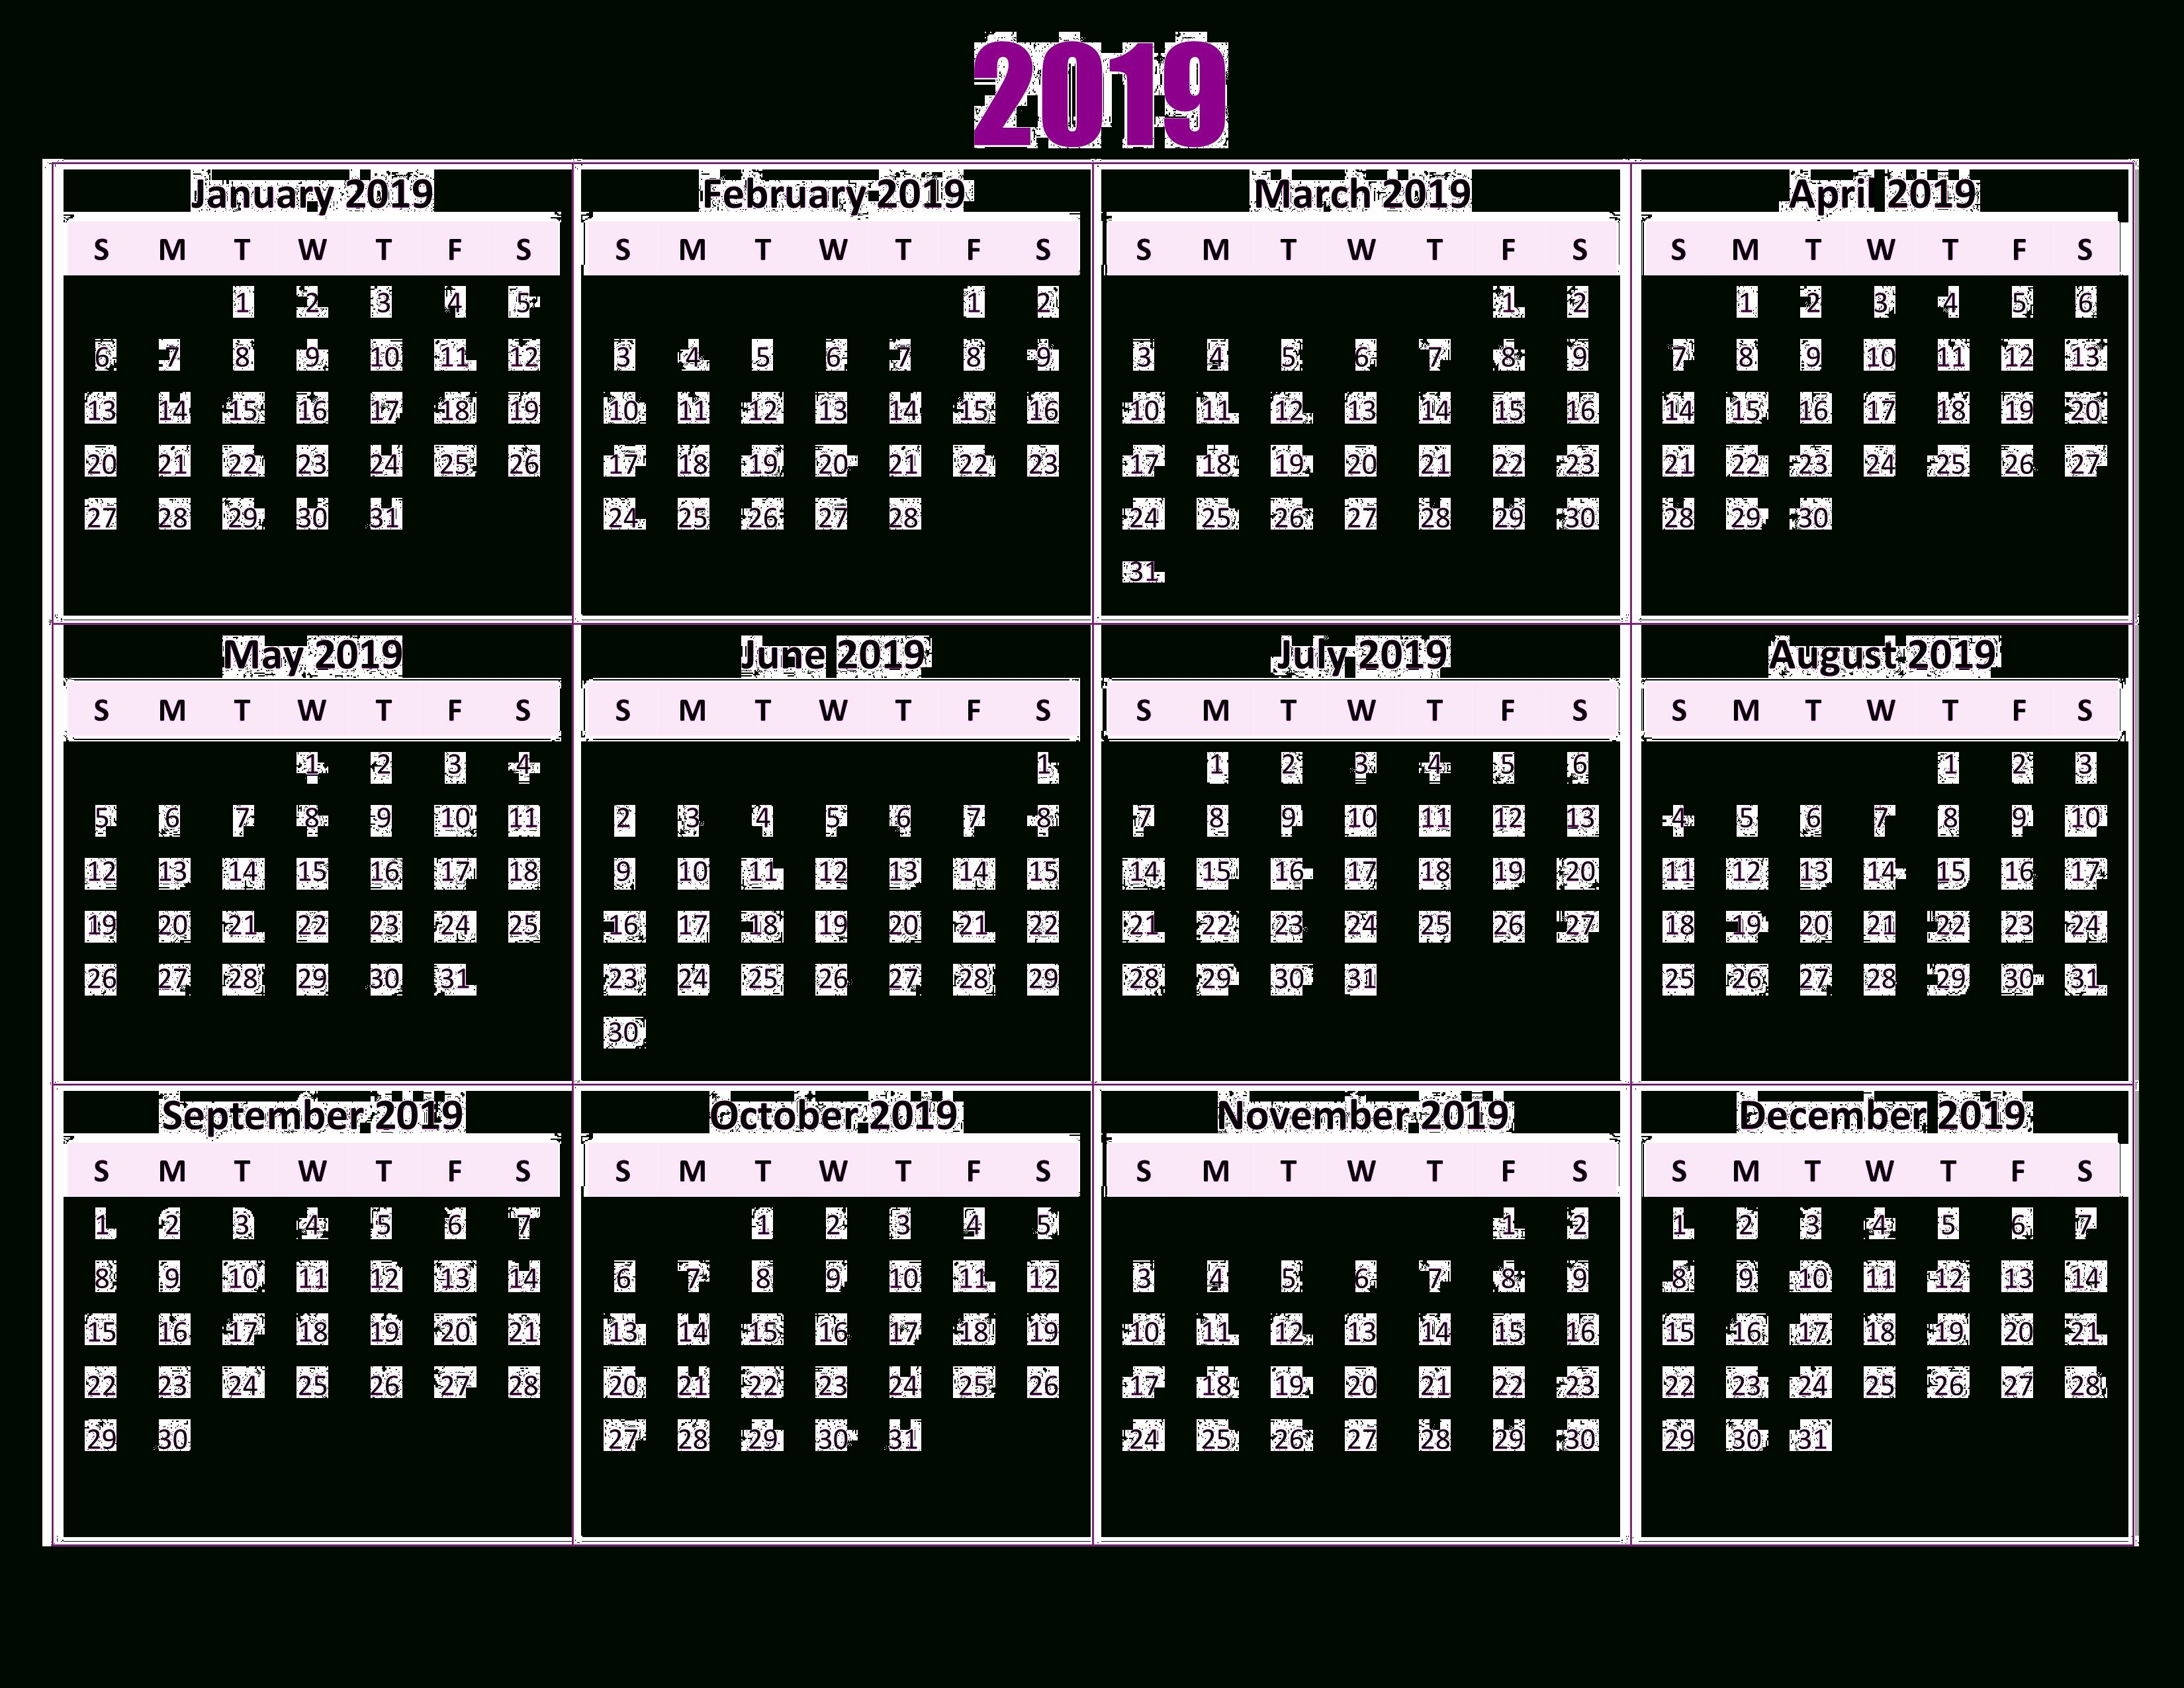 30+] 2019 Calendar Wallpapers On Wallpapersafari Calendar 2019 Wallpaper